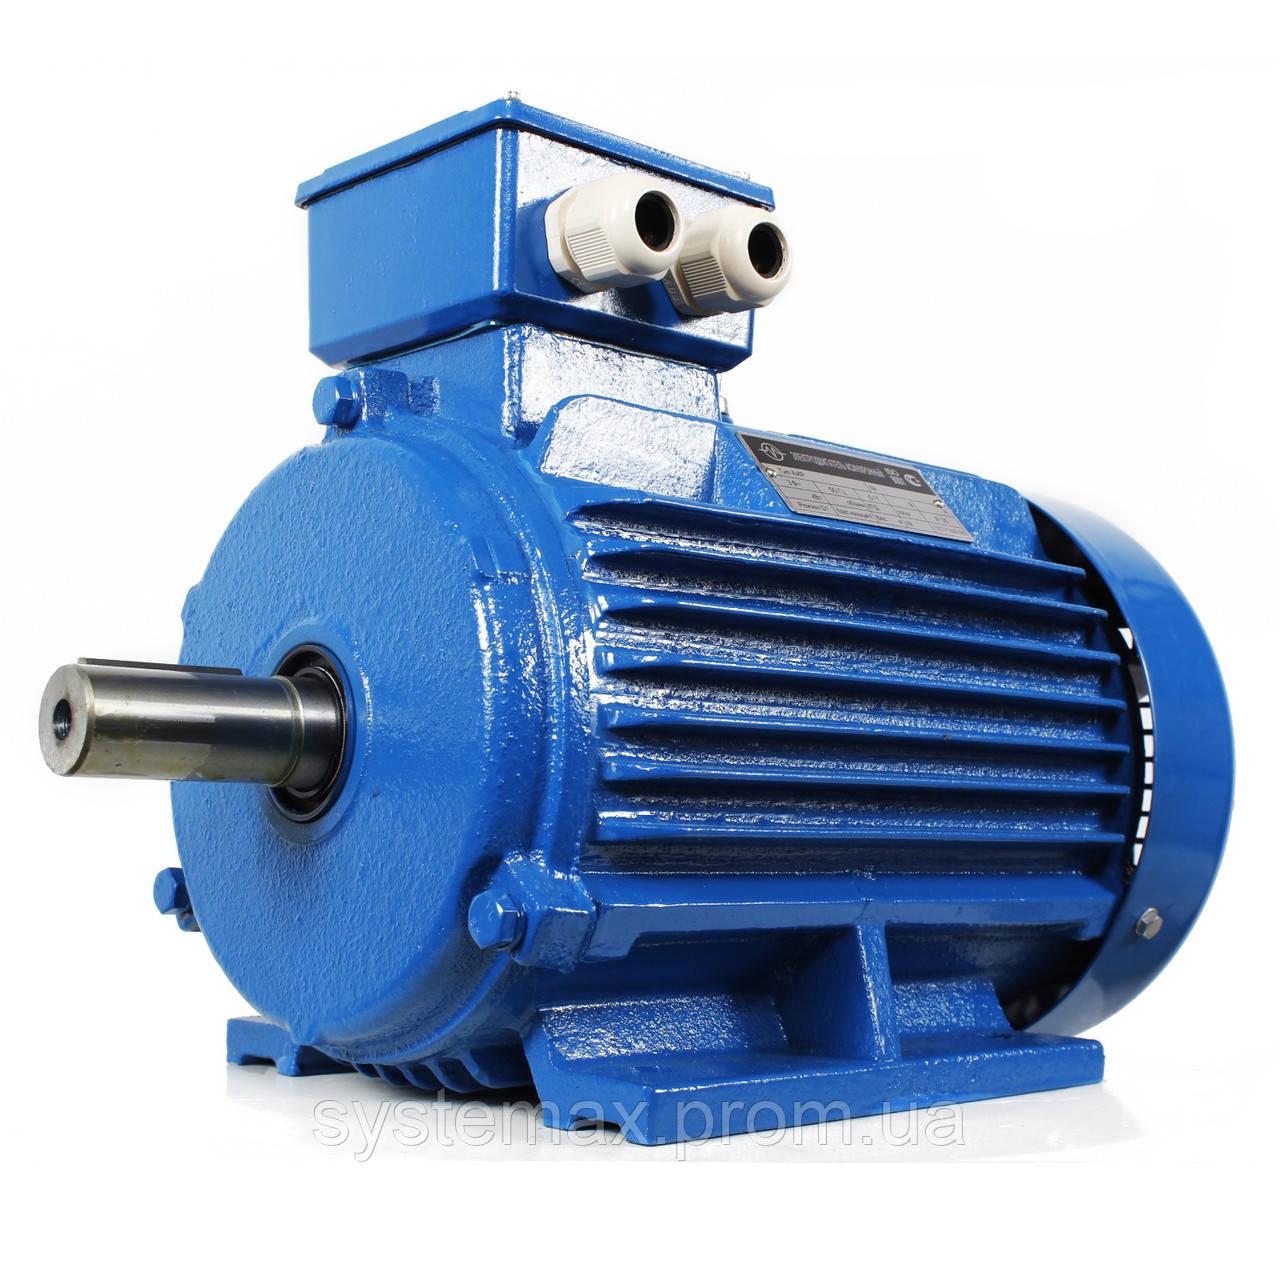 Электродвигатель АИР132S8 (АИР 132 S8) 4 кВт 750 об/мин